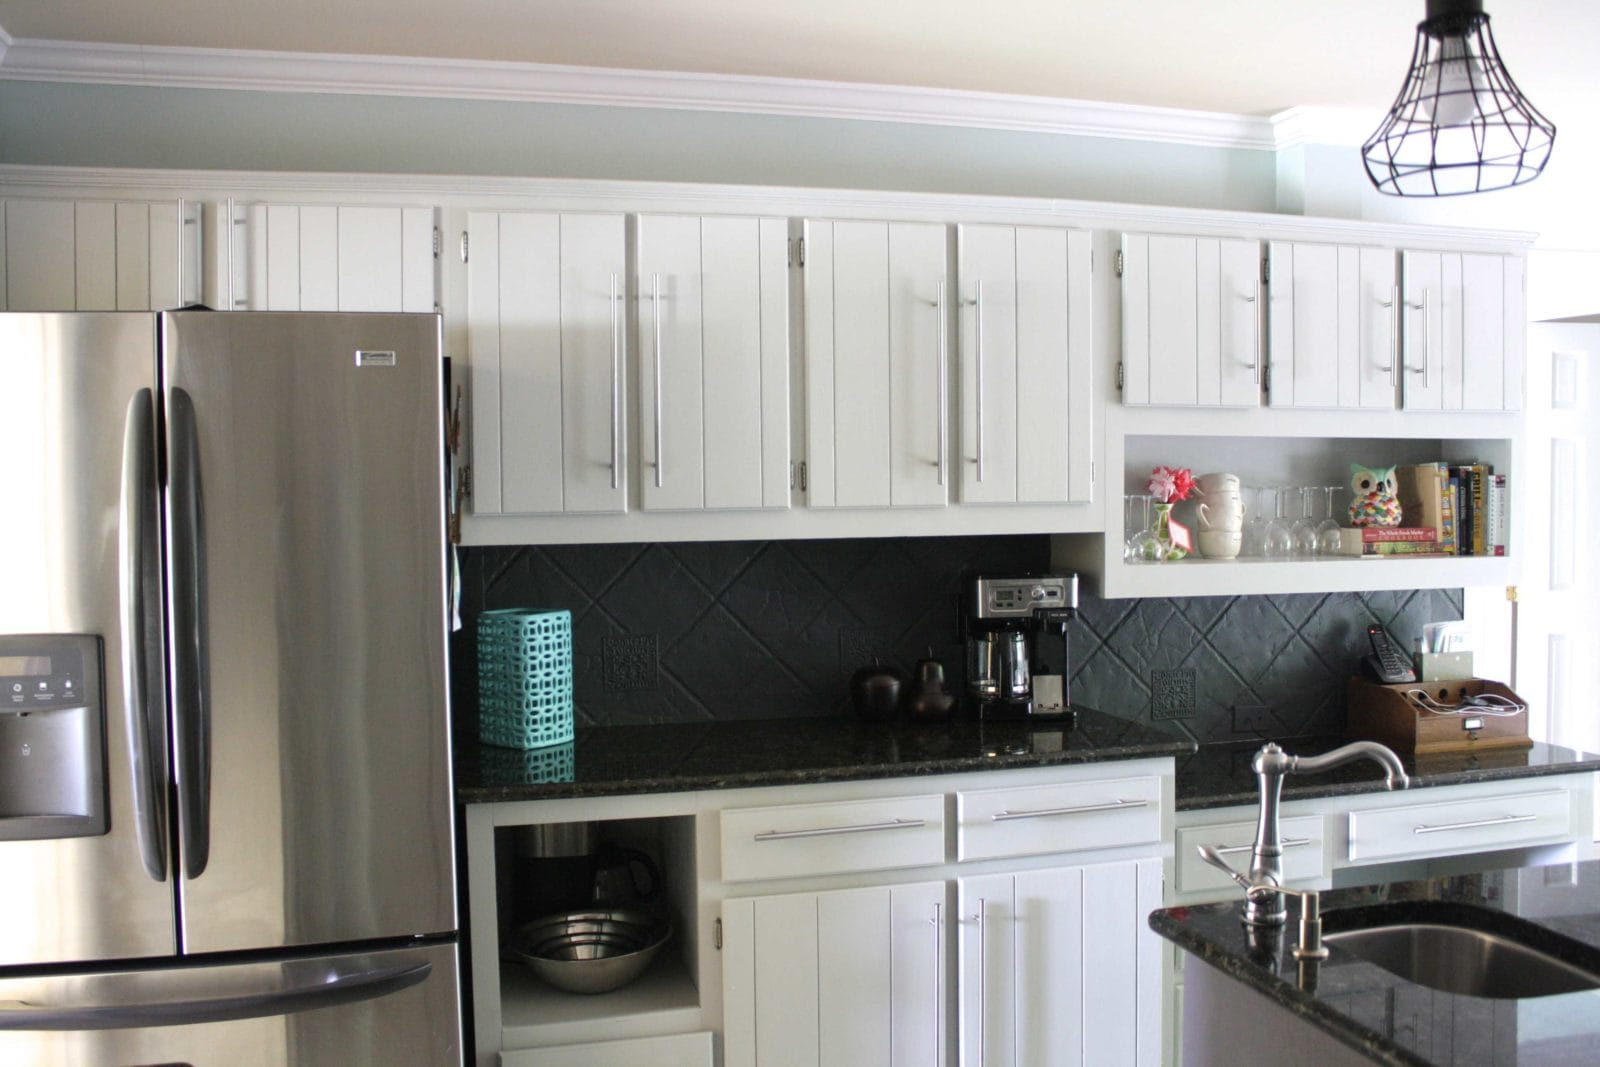 Our Budget Kitchen Remodel REVEAL ~ Part 1 | Designertrapped.com